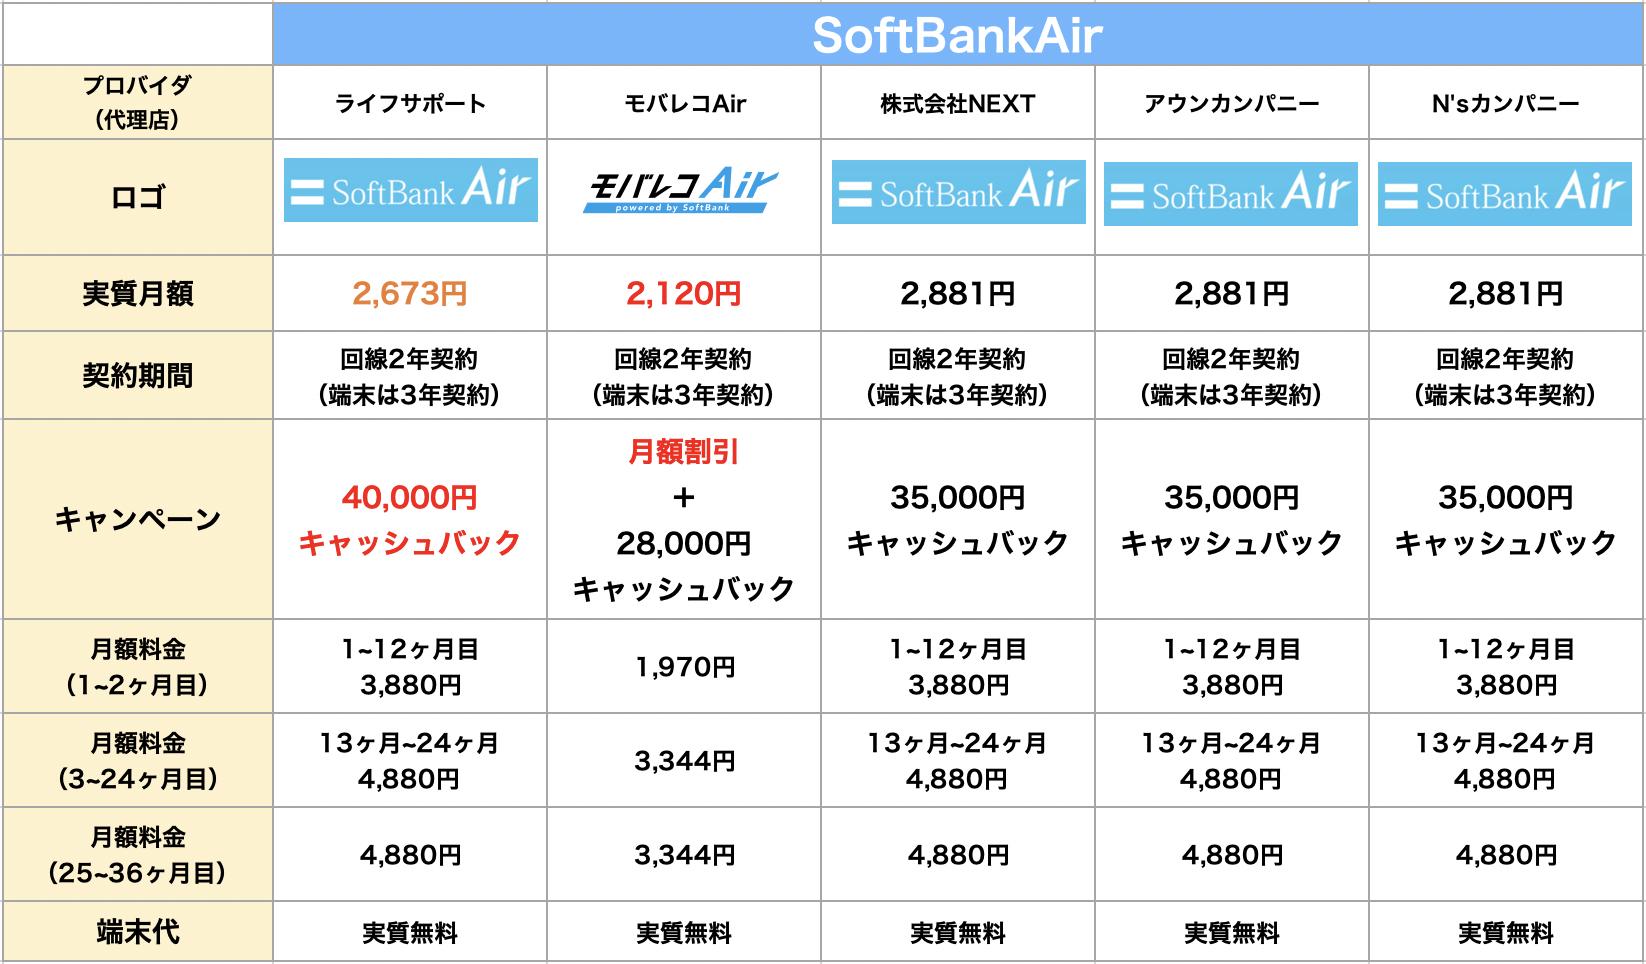 softbankair-hikaku